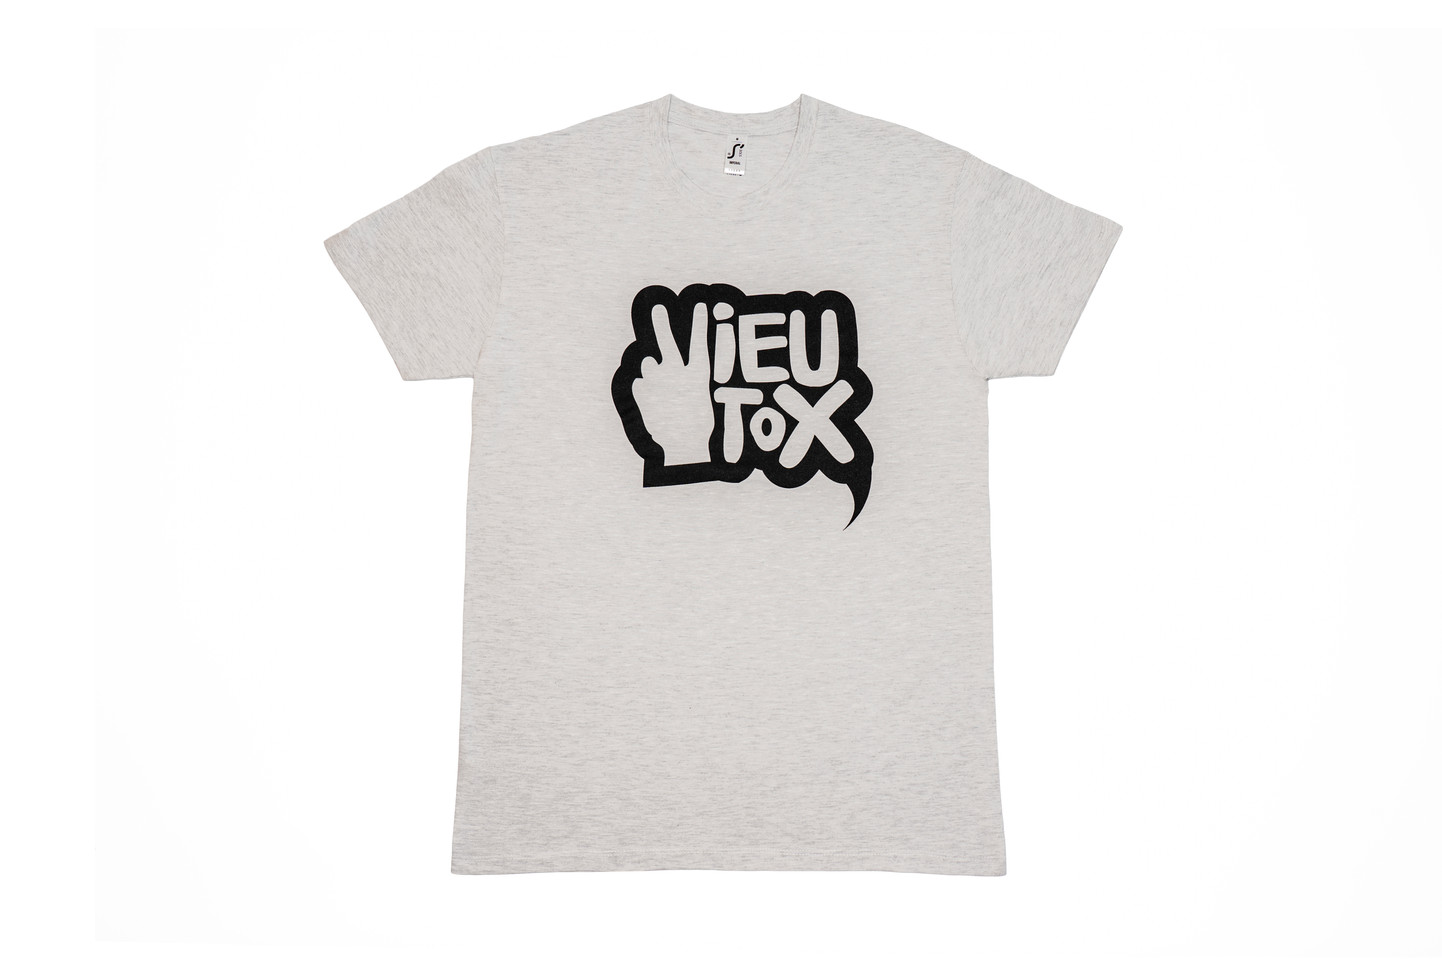 VIEUX TOX.jpg